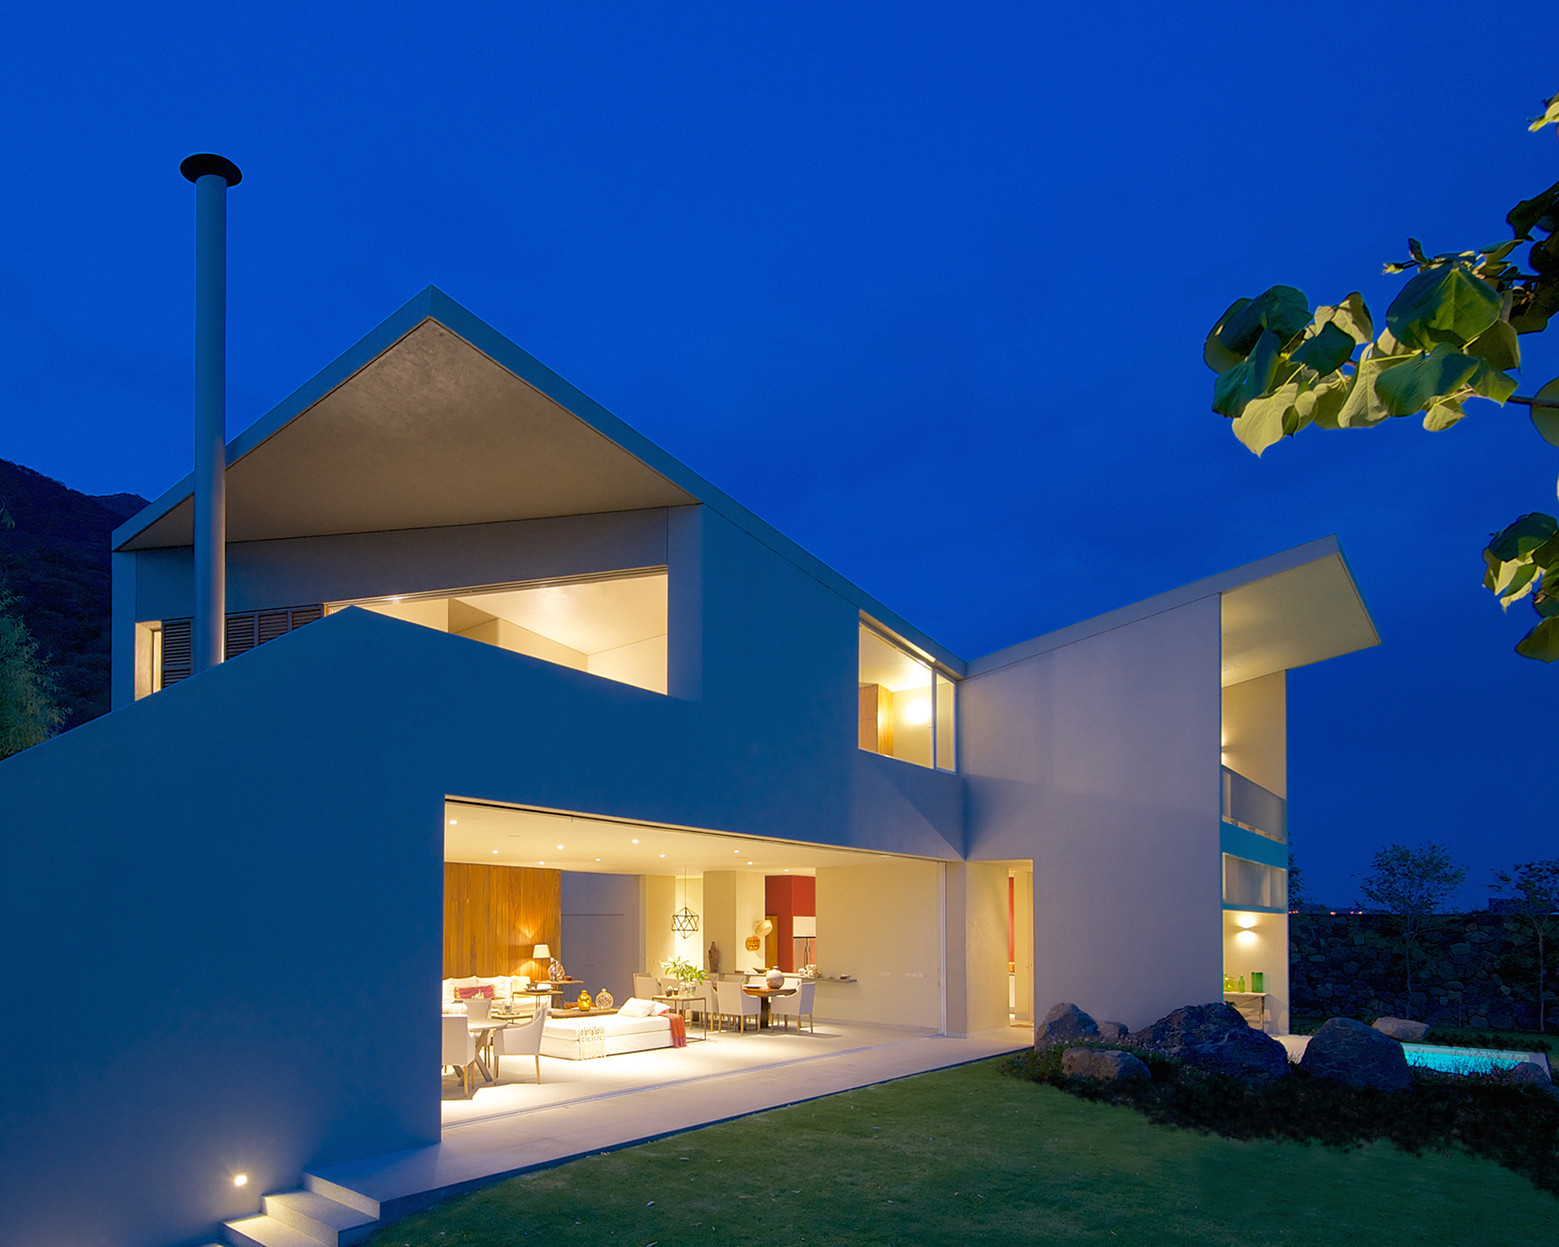 Lake House / Juan Ignacio Castiello Arquitectos